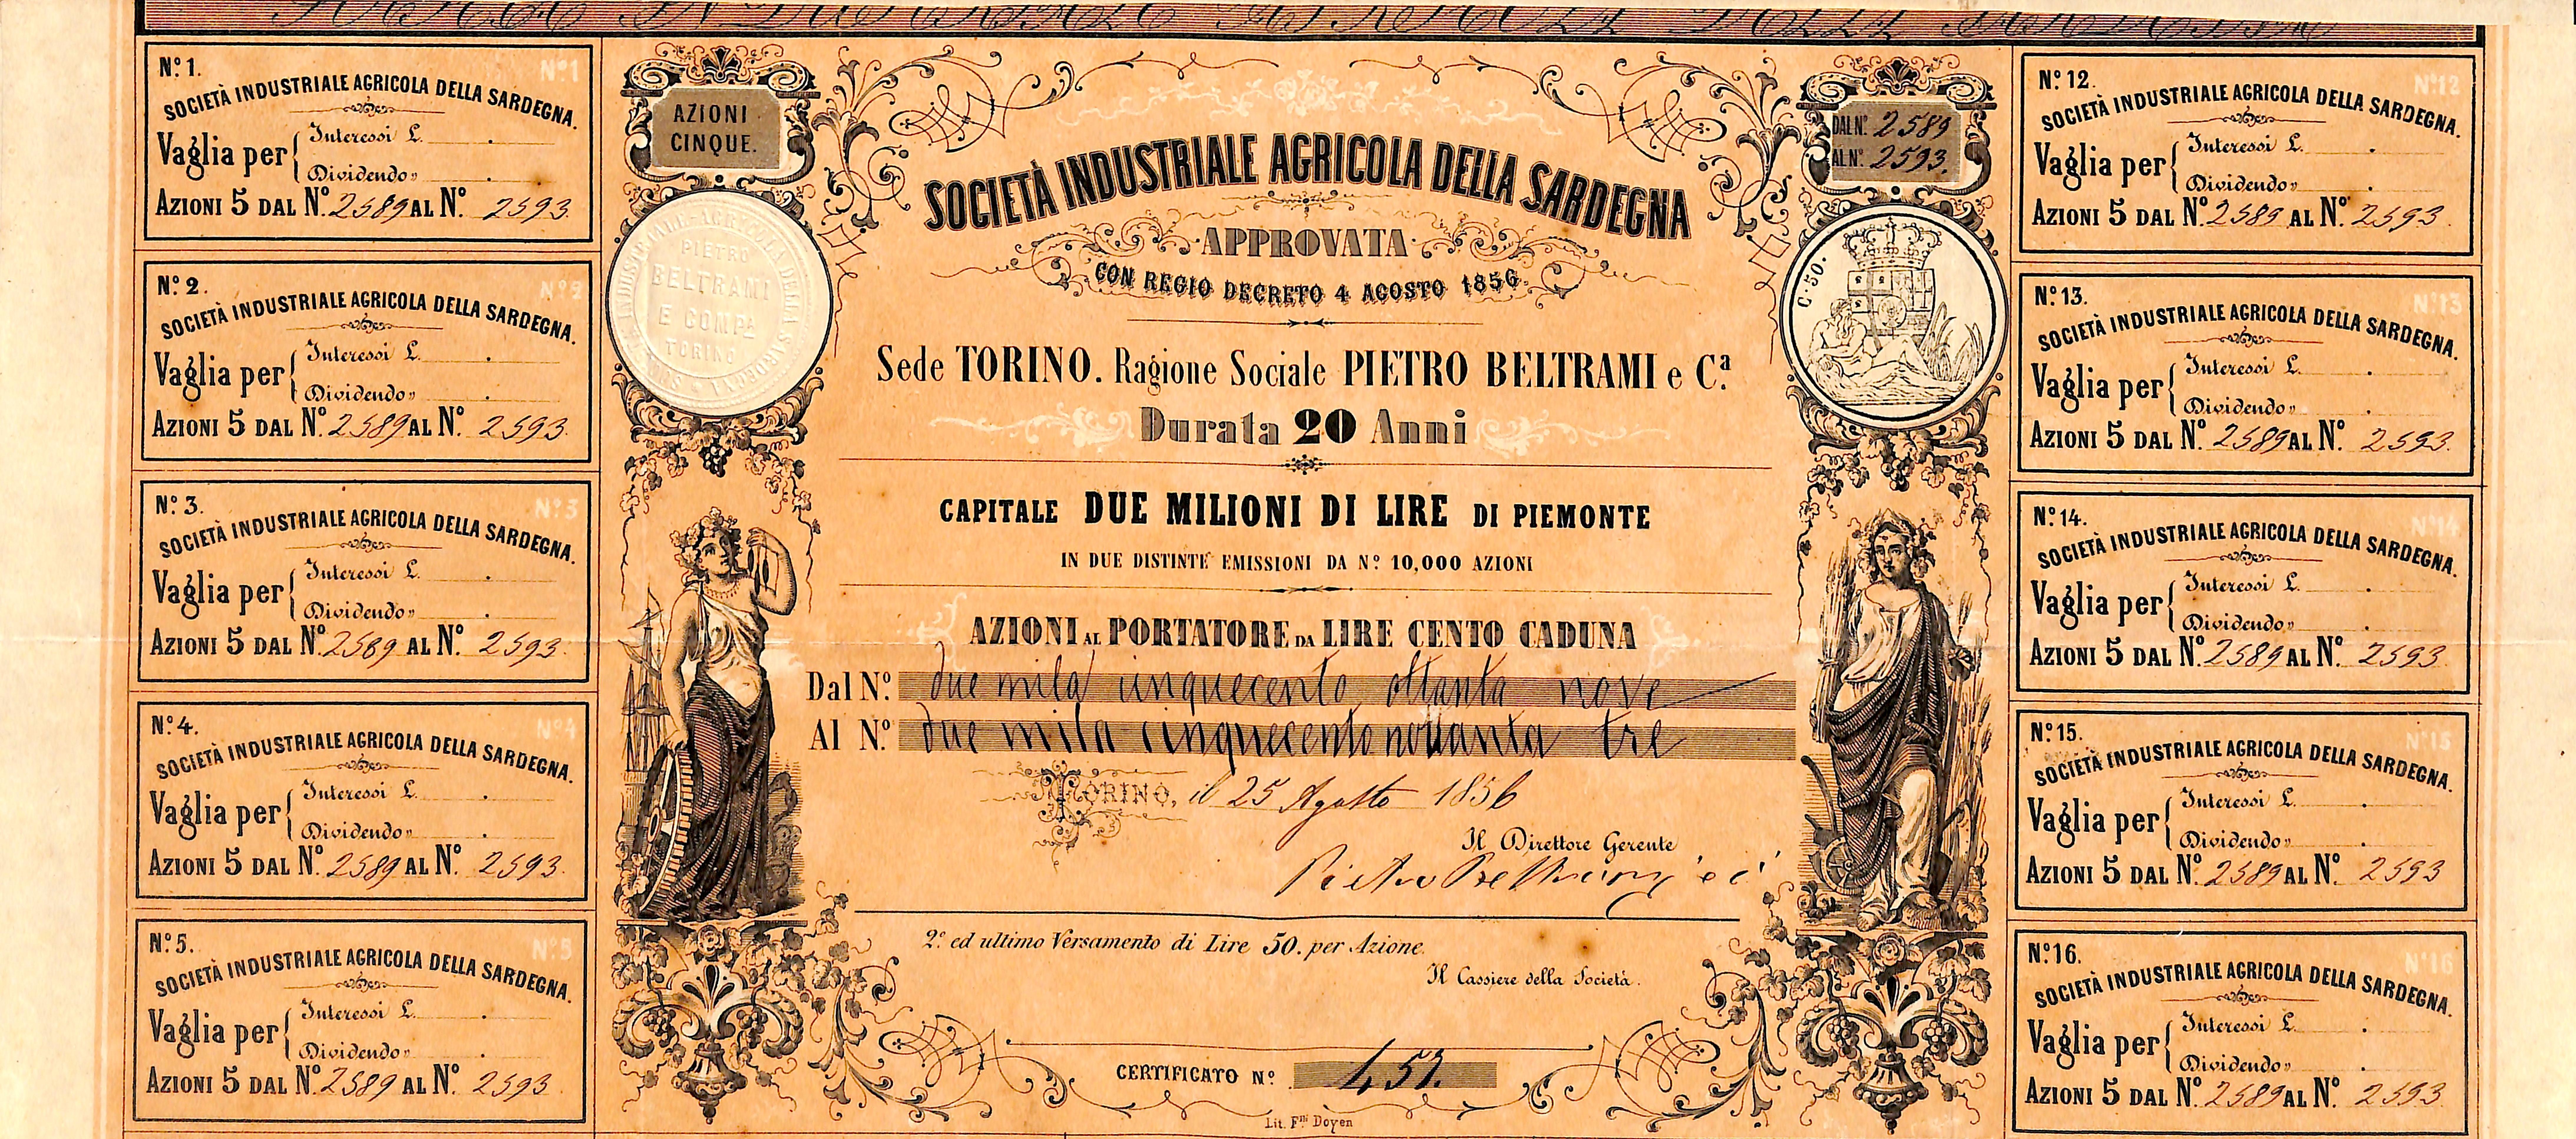 1856SOCIETAINDUSTRIALEAGRICOLADELLASARDEGNA